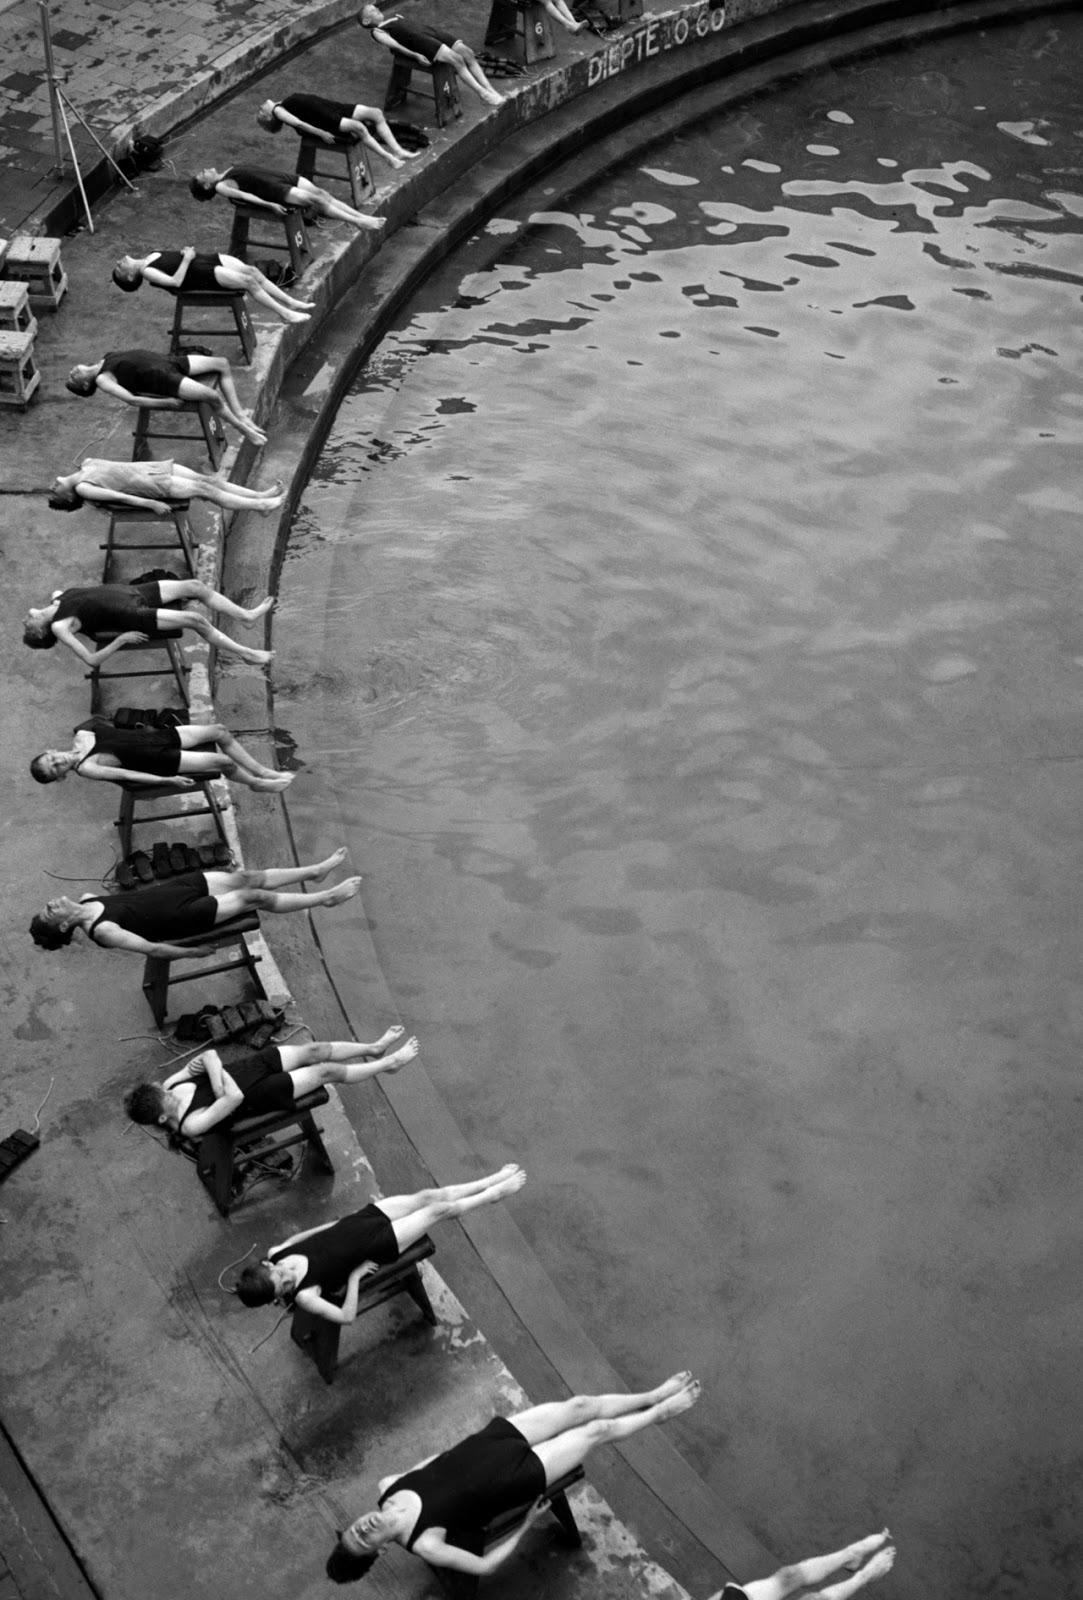 Pool in den haag - 3 10